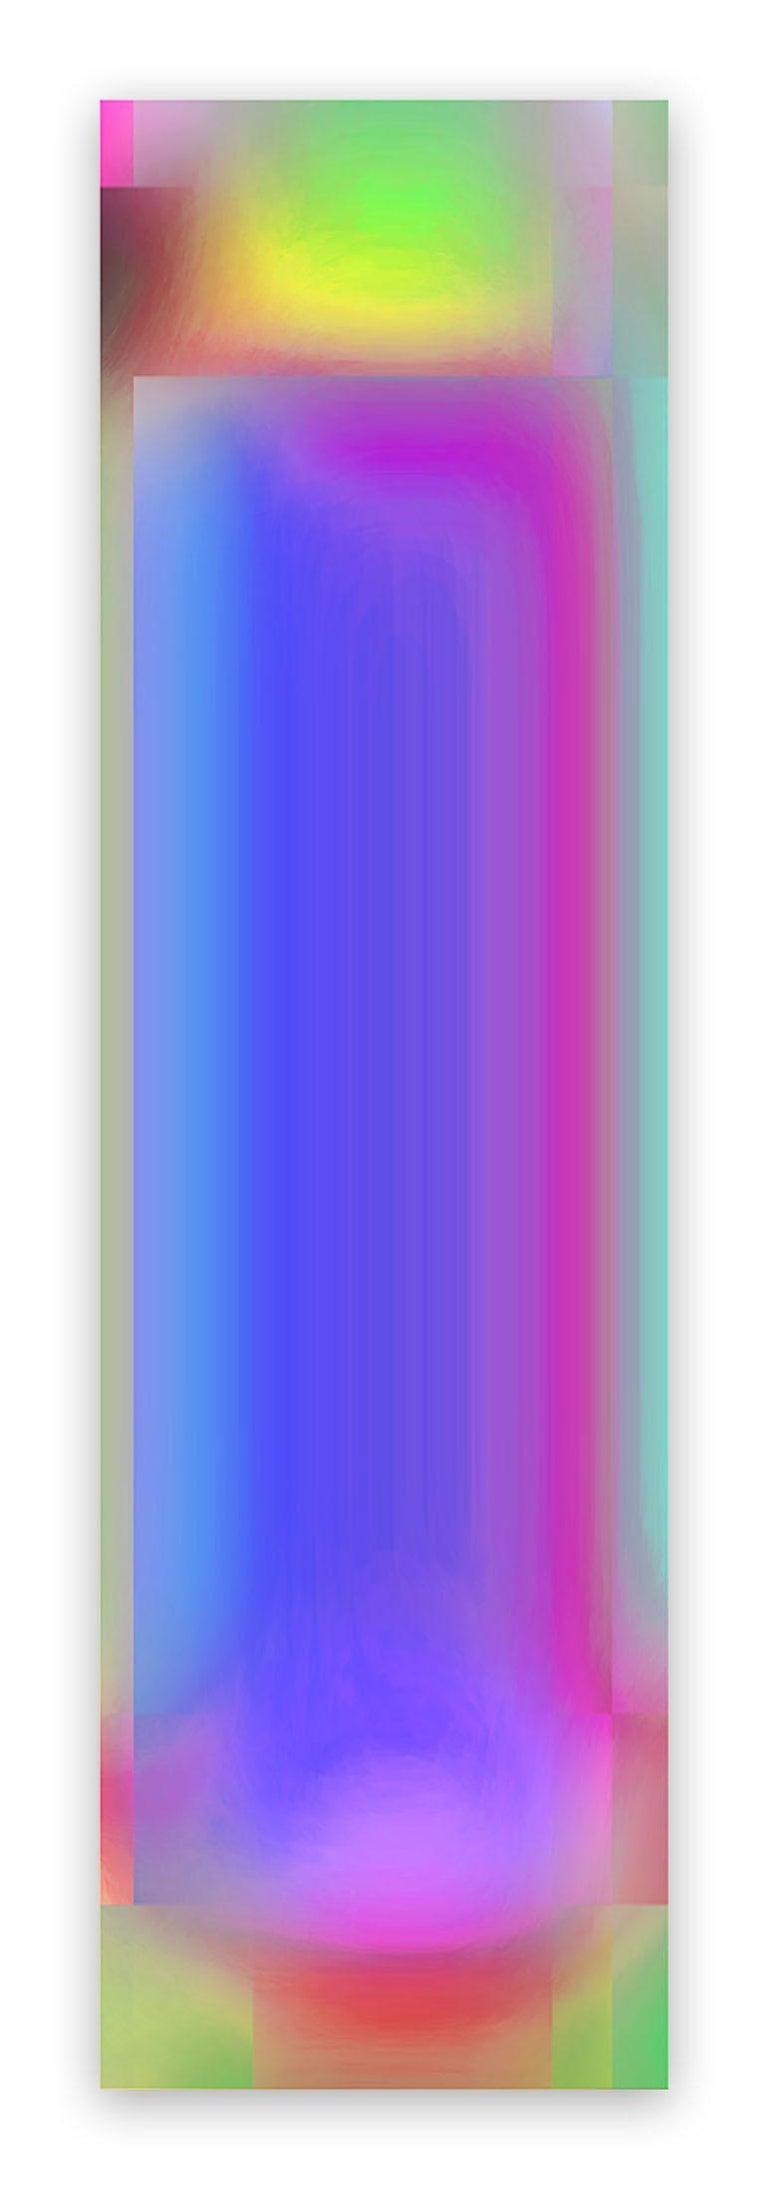 Bill Kane Abstract Photograph - EM-78 Vajra 3 (Abstract new media)